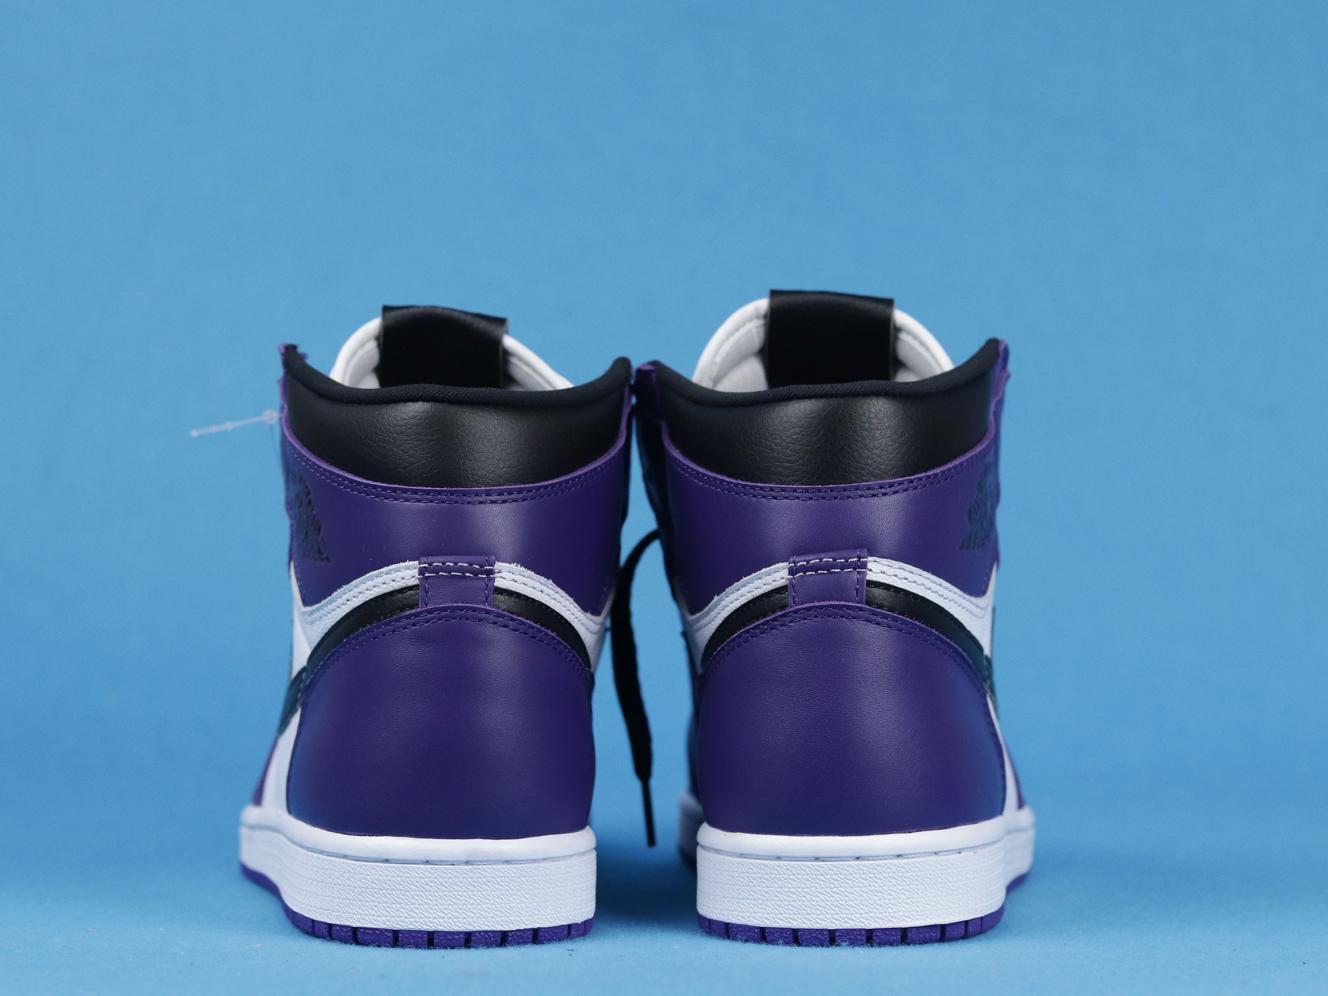 Air Jordan 1 Retro High OG Court Purple 2.0 4